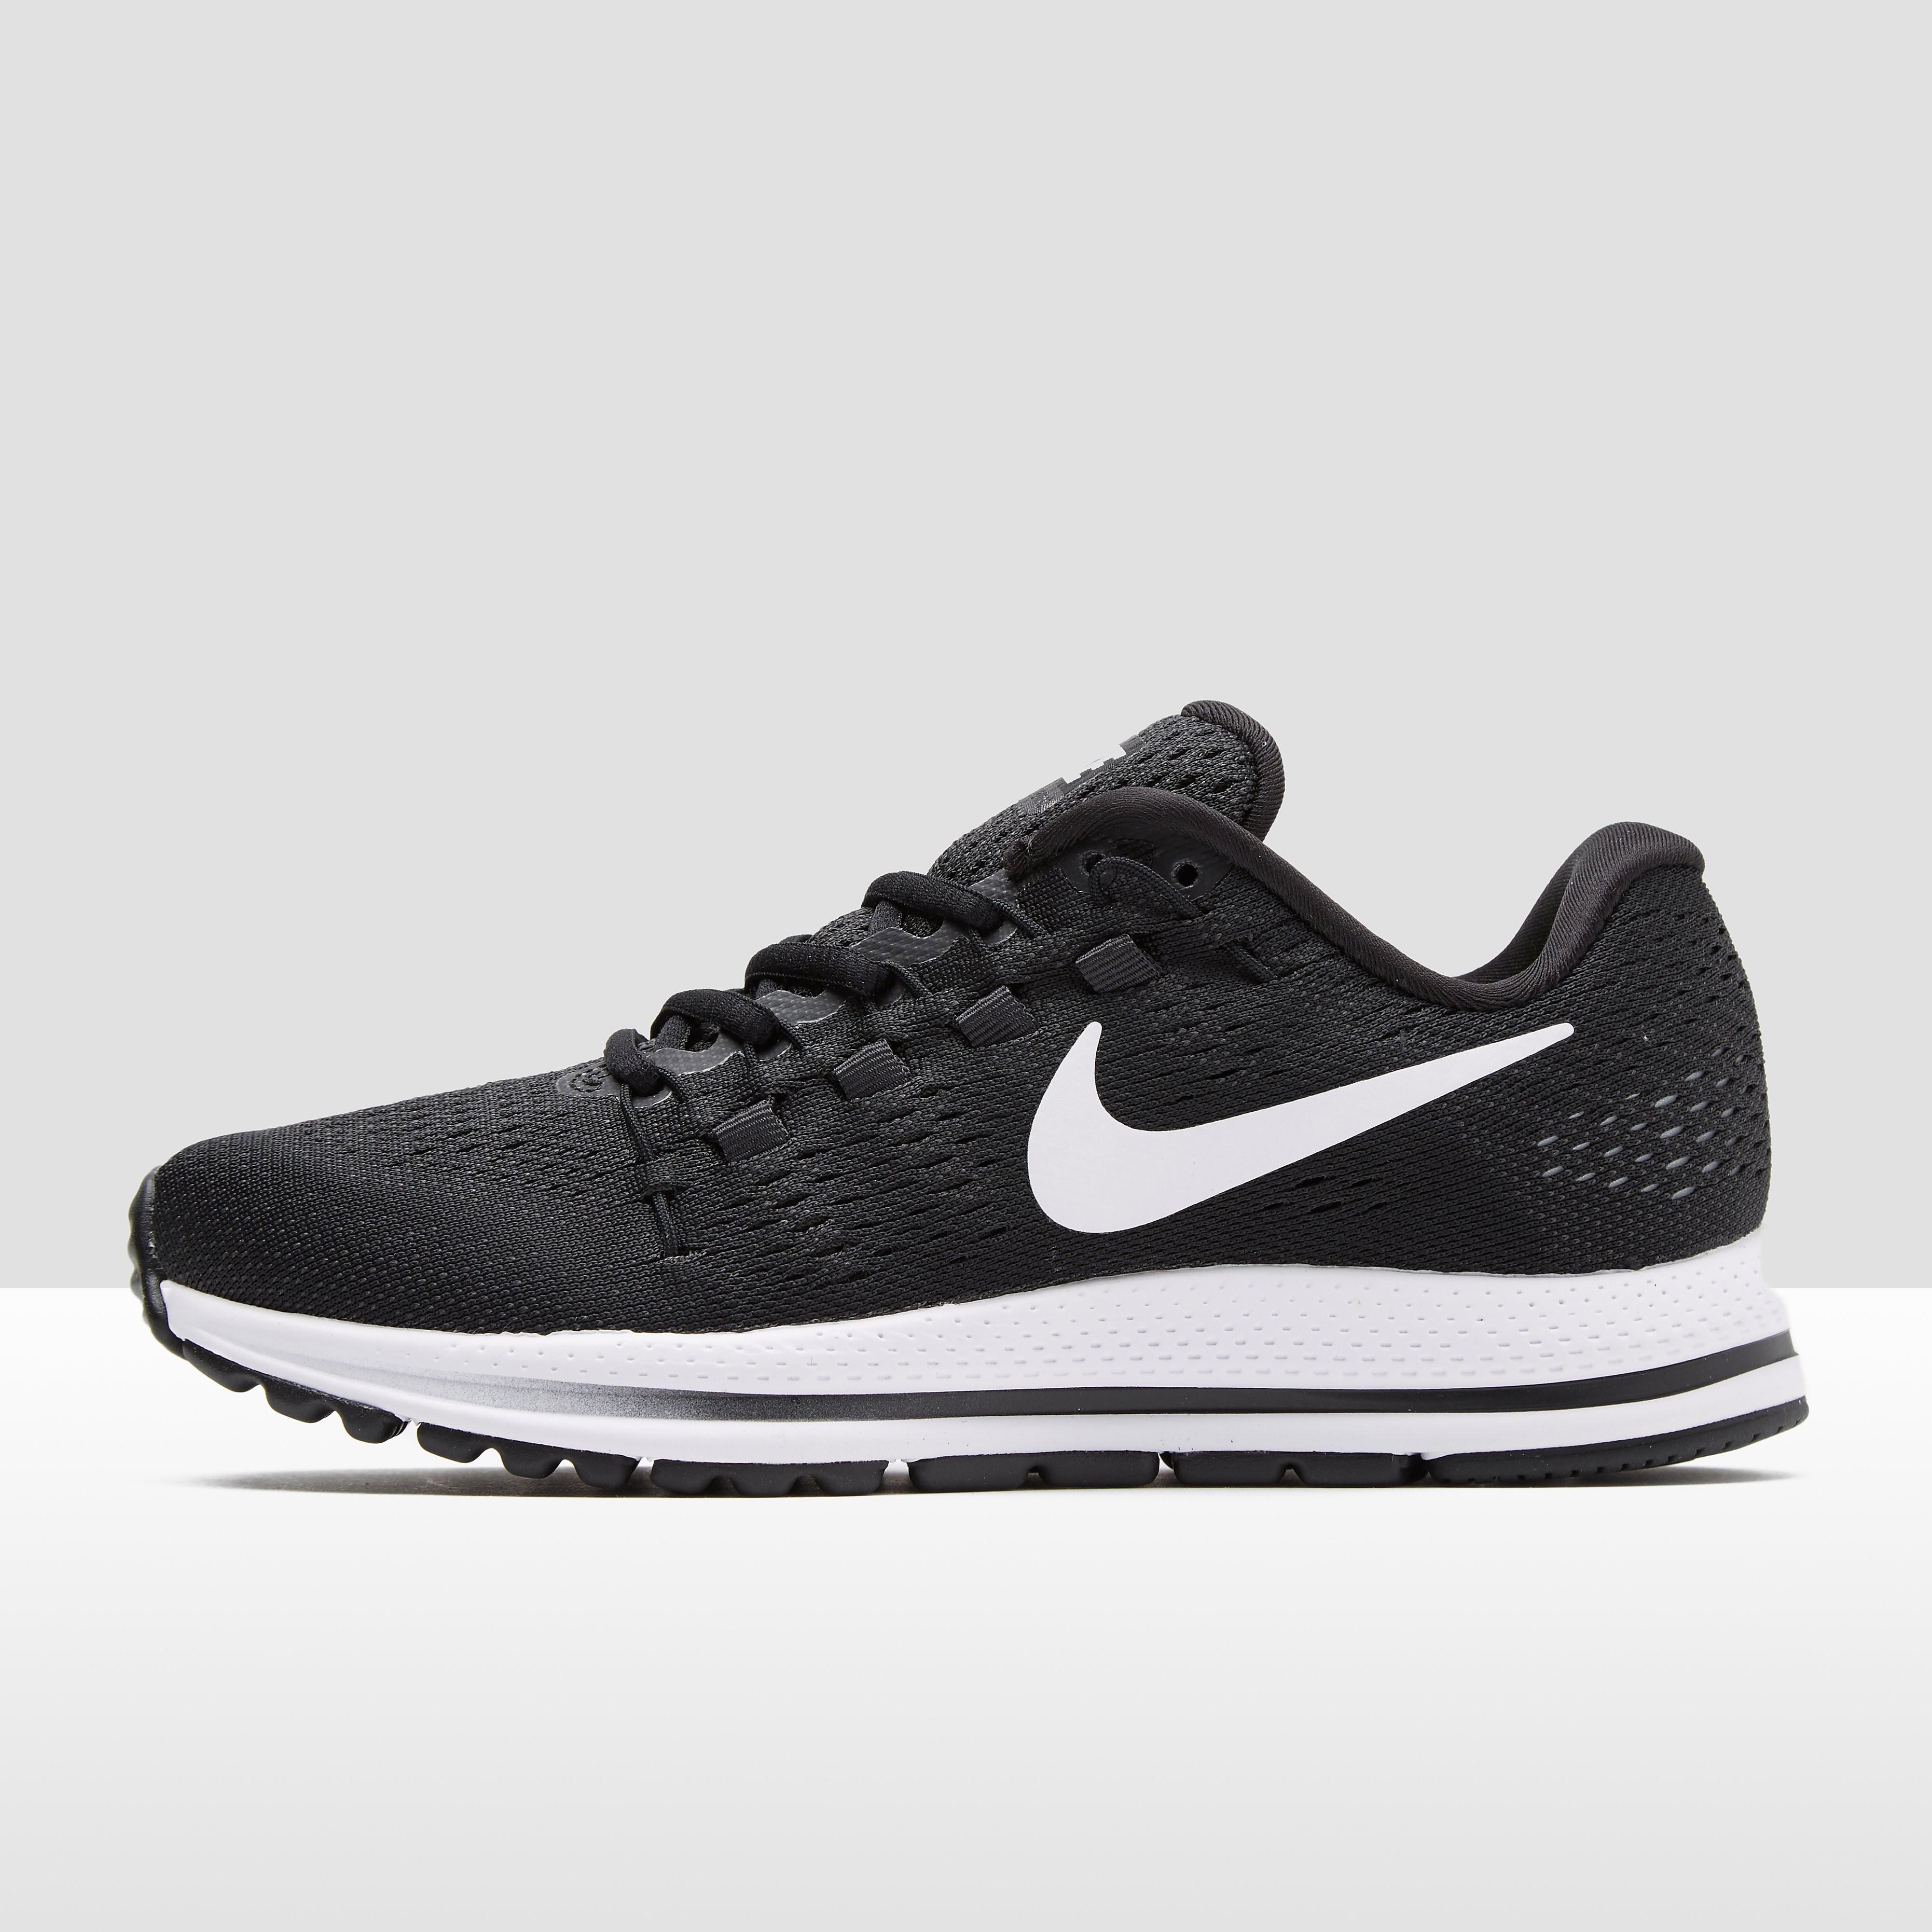 Nike Air Zoom Vomero 12 Women's Running Shoes